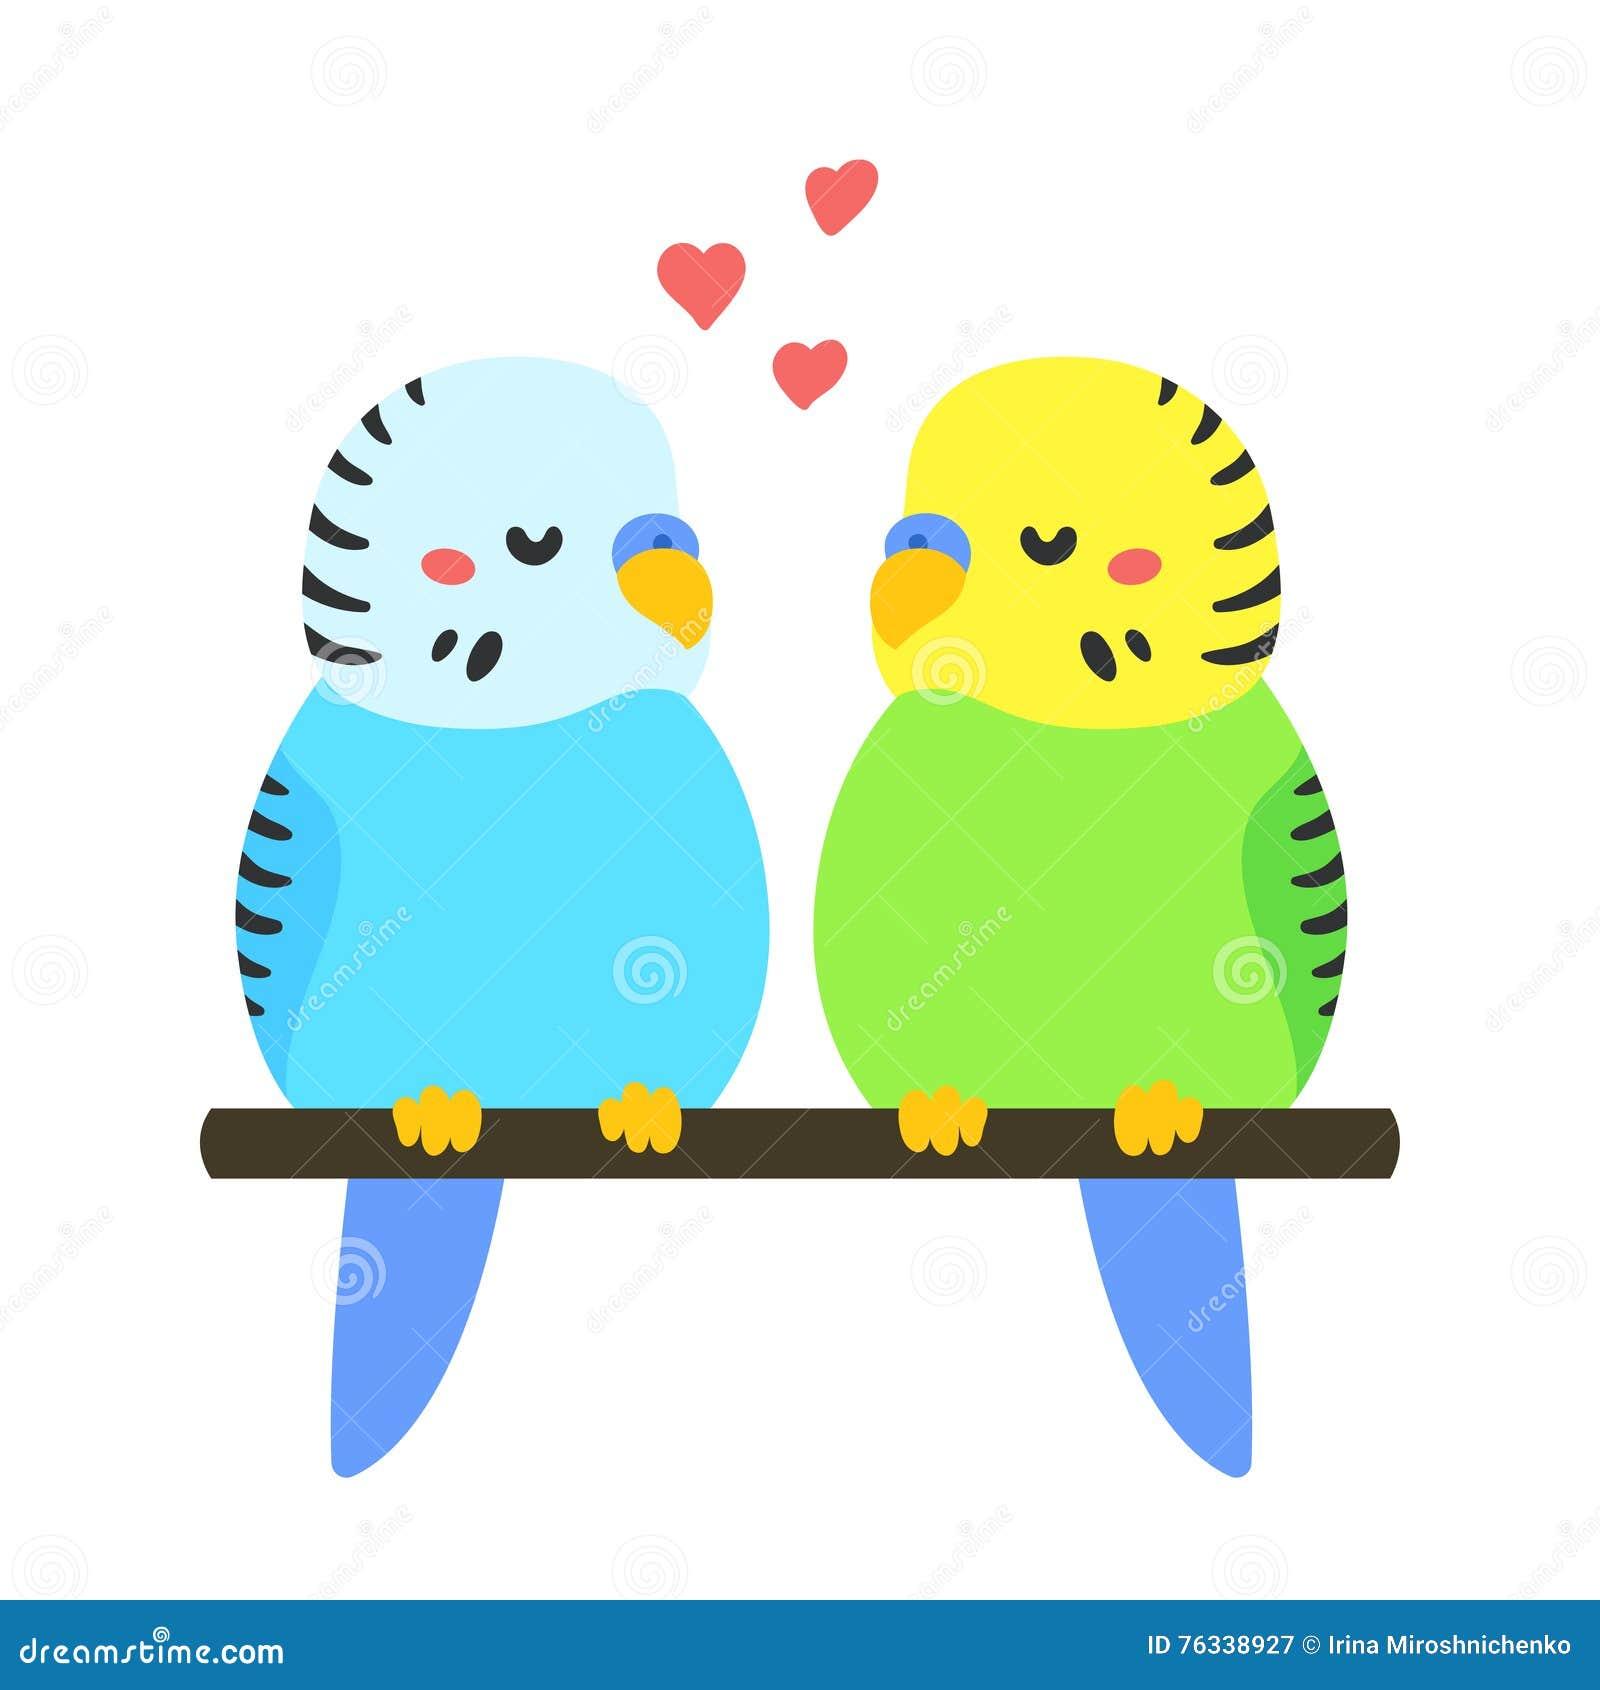 budgie stock illustrations 203 budgie stock illustrations rh dreamstime com green parakeet clipart Cartoon Parakeet